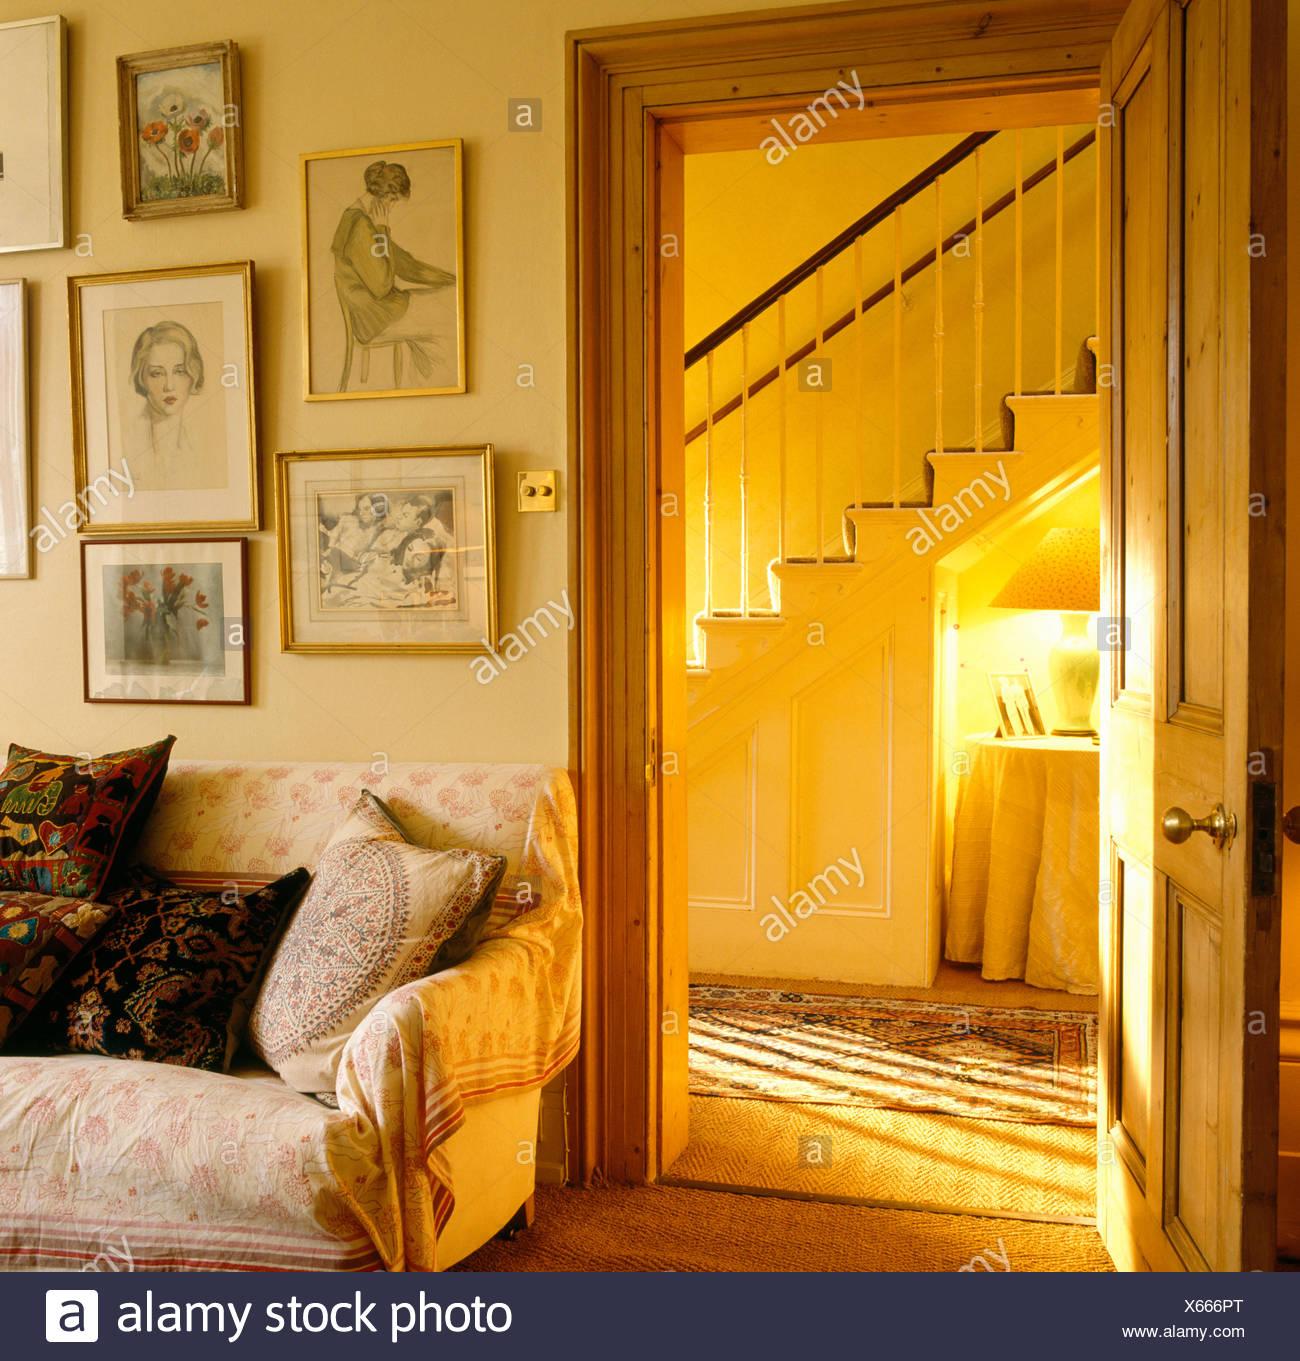 Eighties living room with framed drawings above sofa beside open door to hall - Stock Image